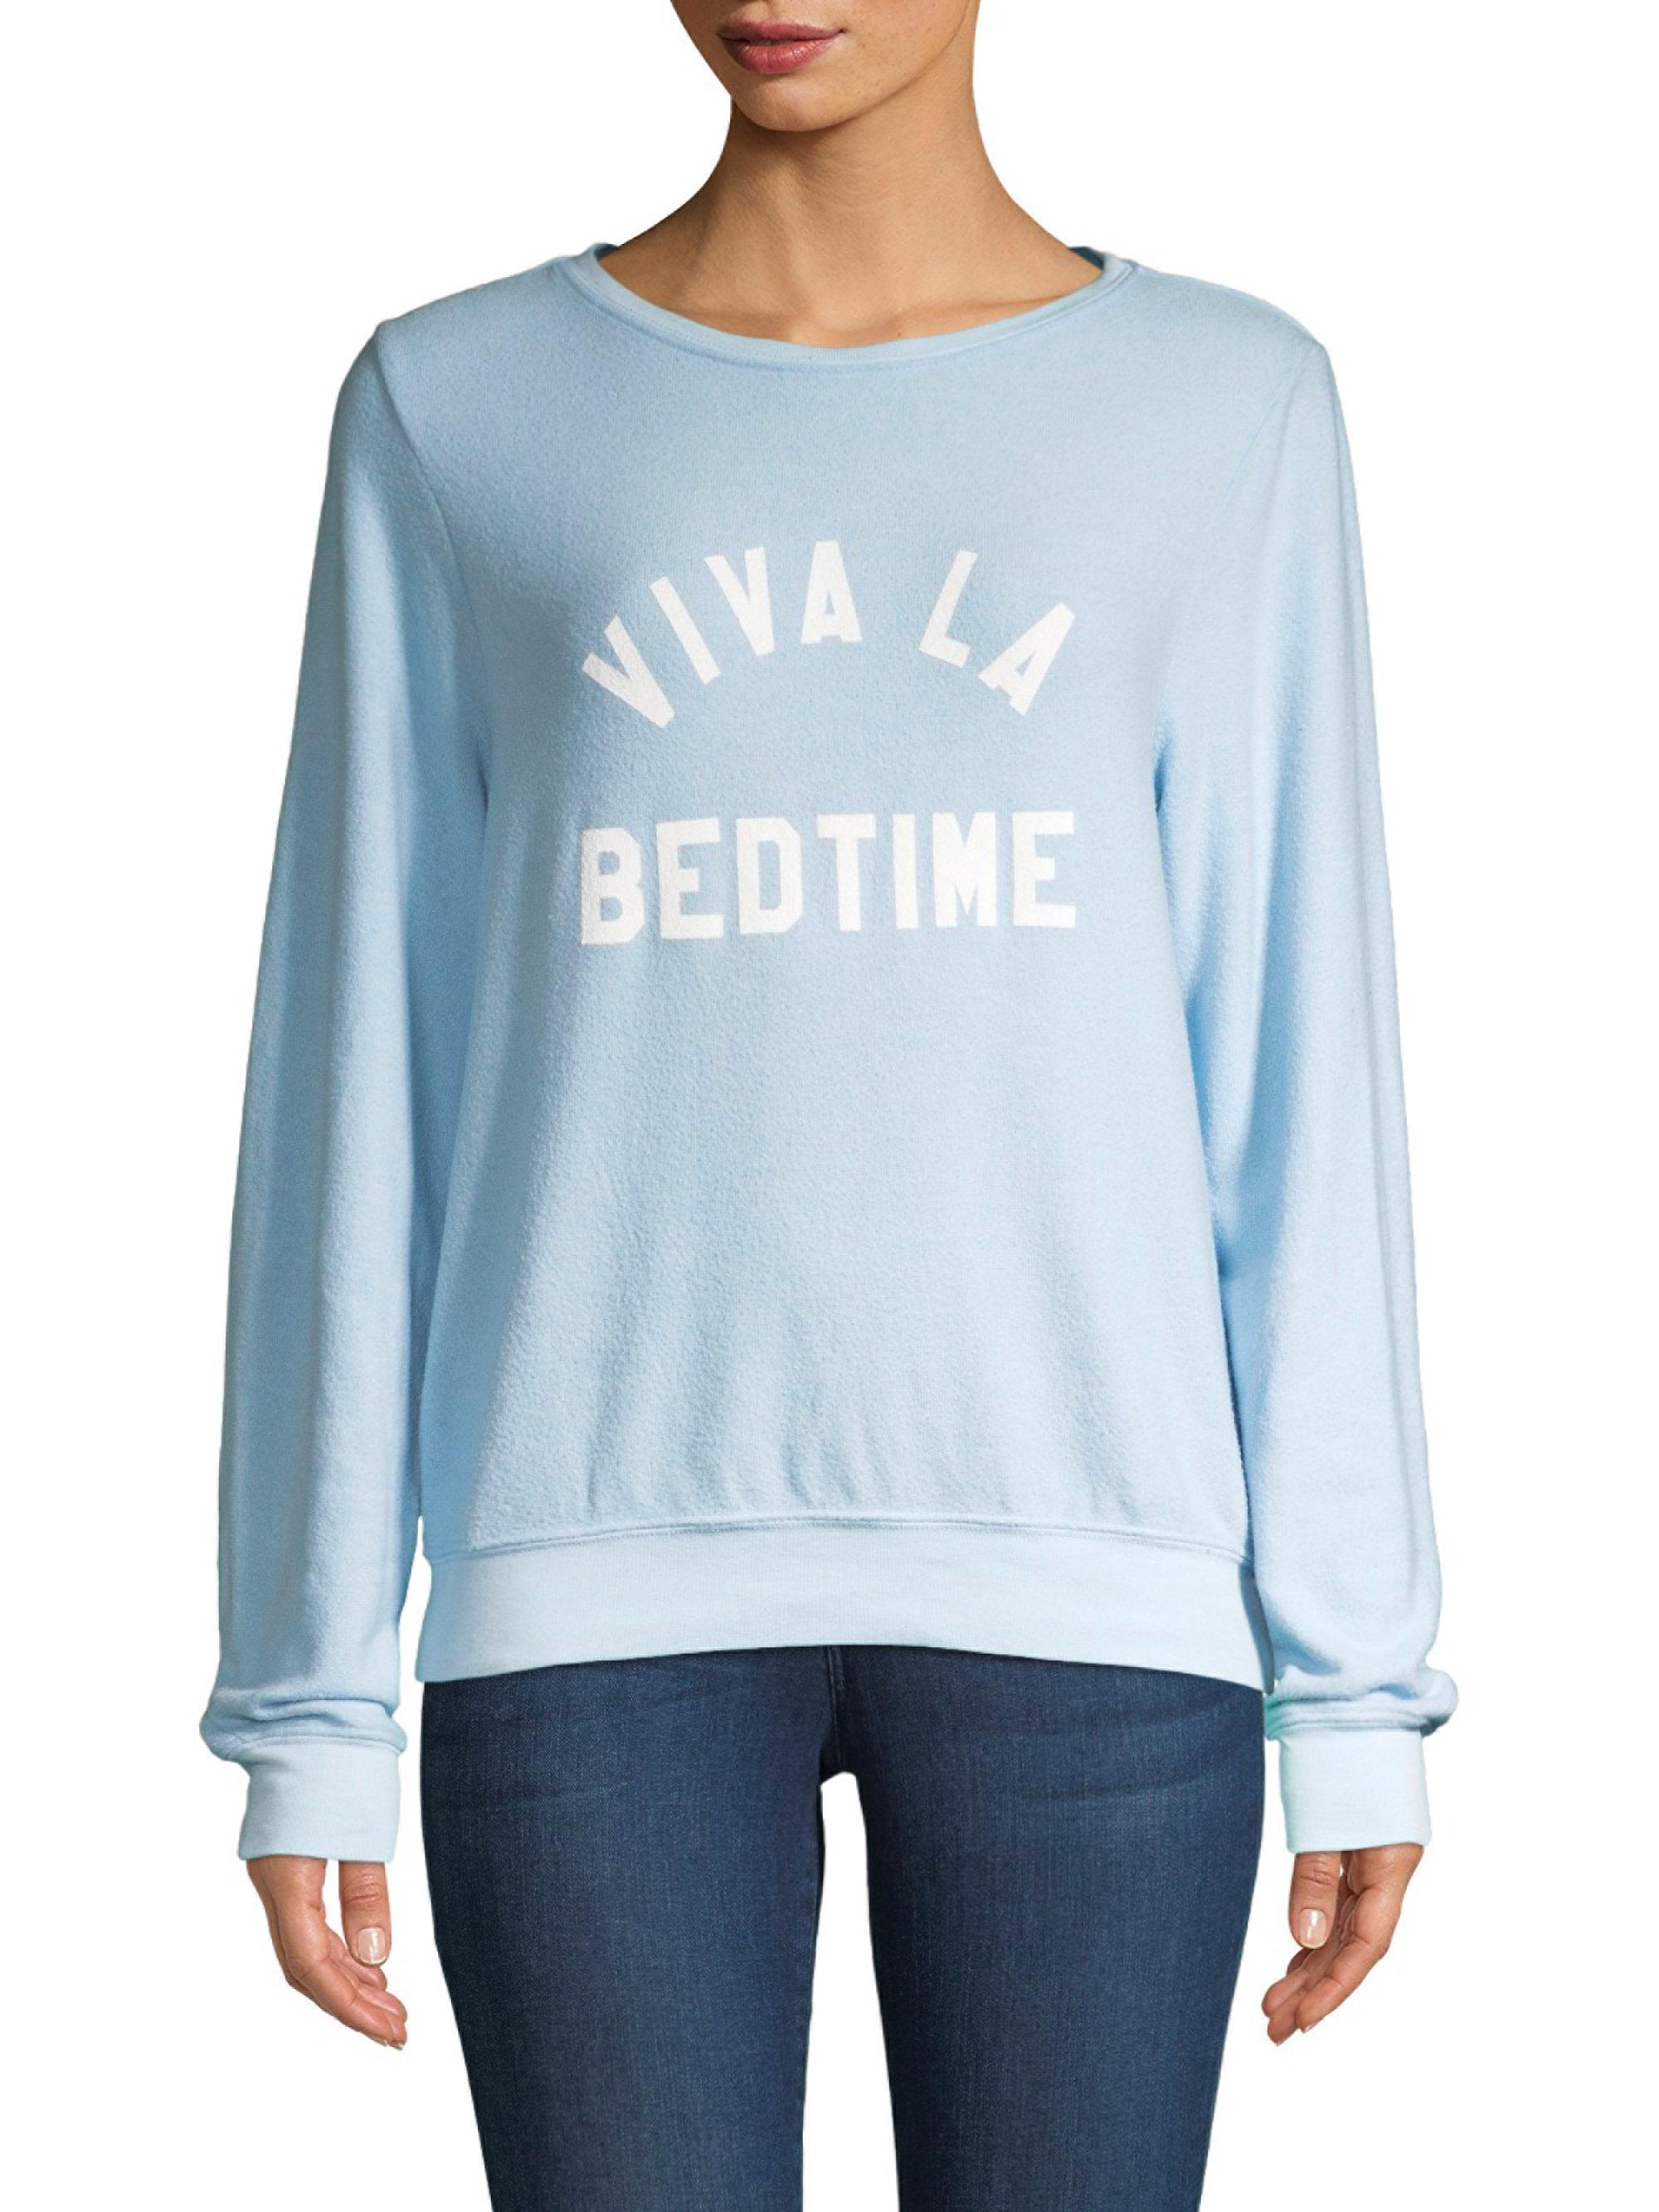 Wildfox. Women's Blue Viva La Bedtime Sweatshirt